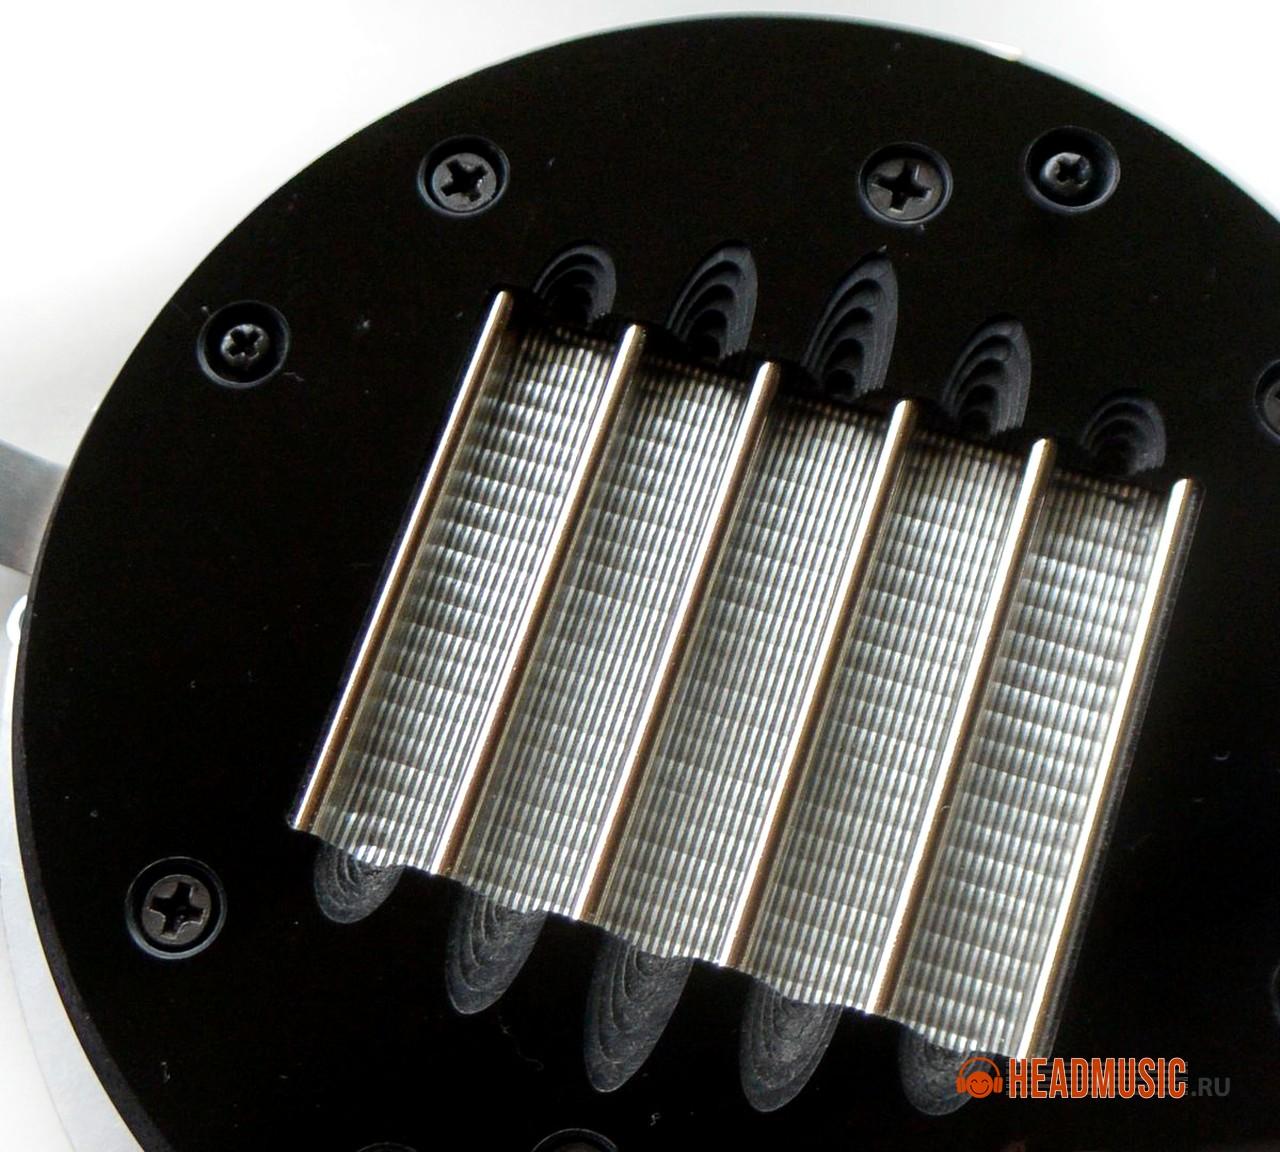 The diaphragm radiator of Snorry planar headphones